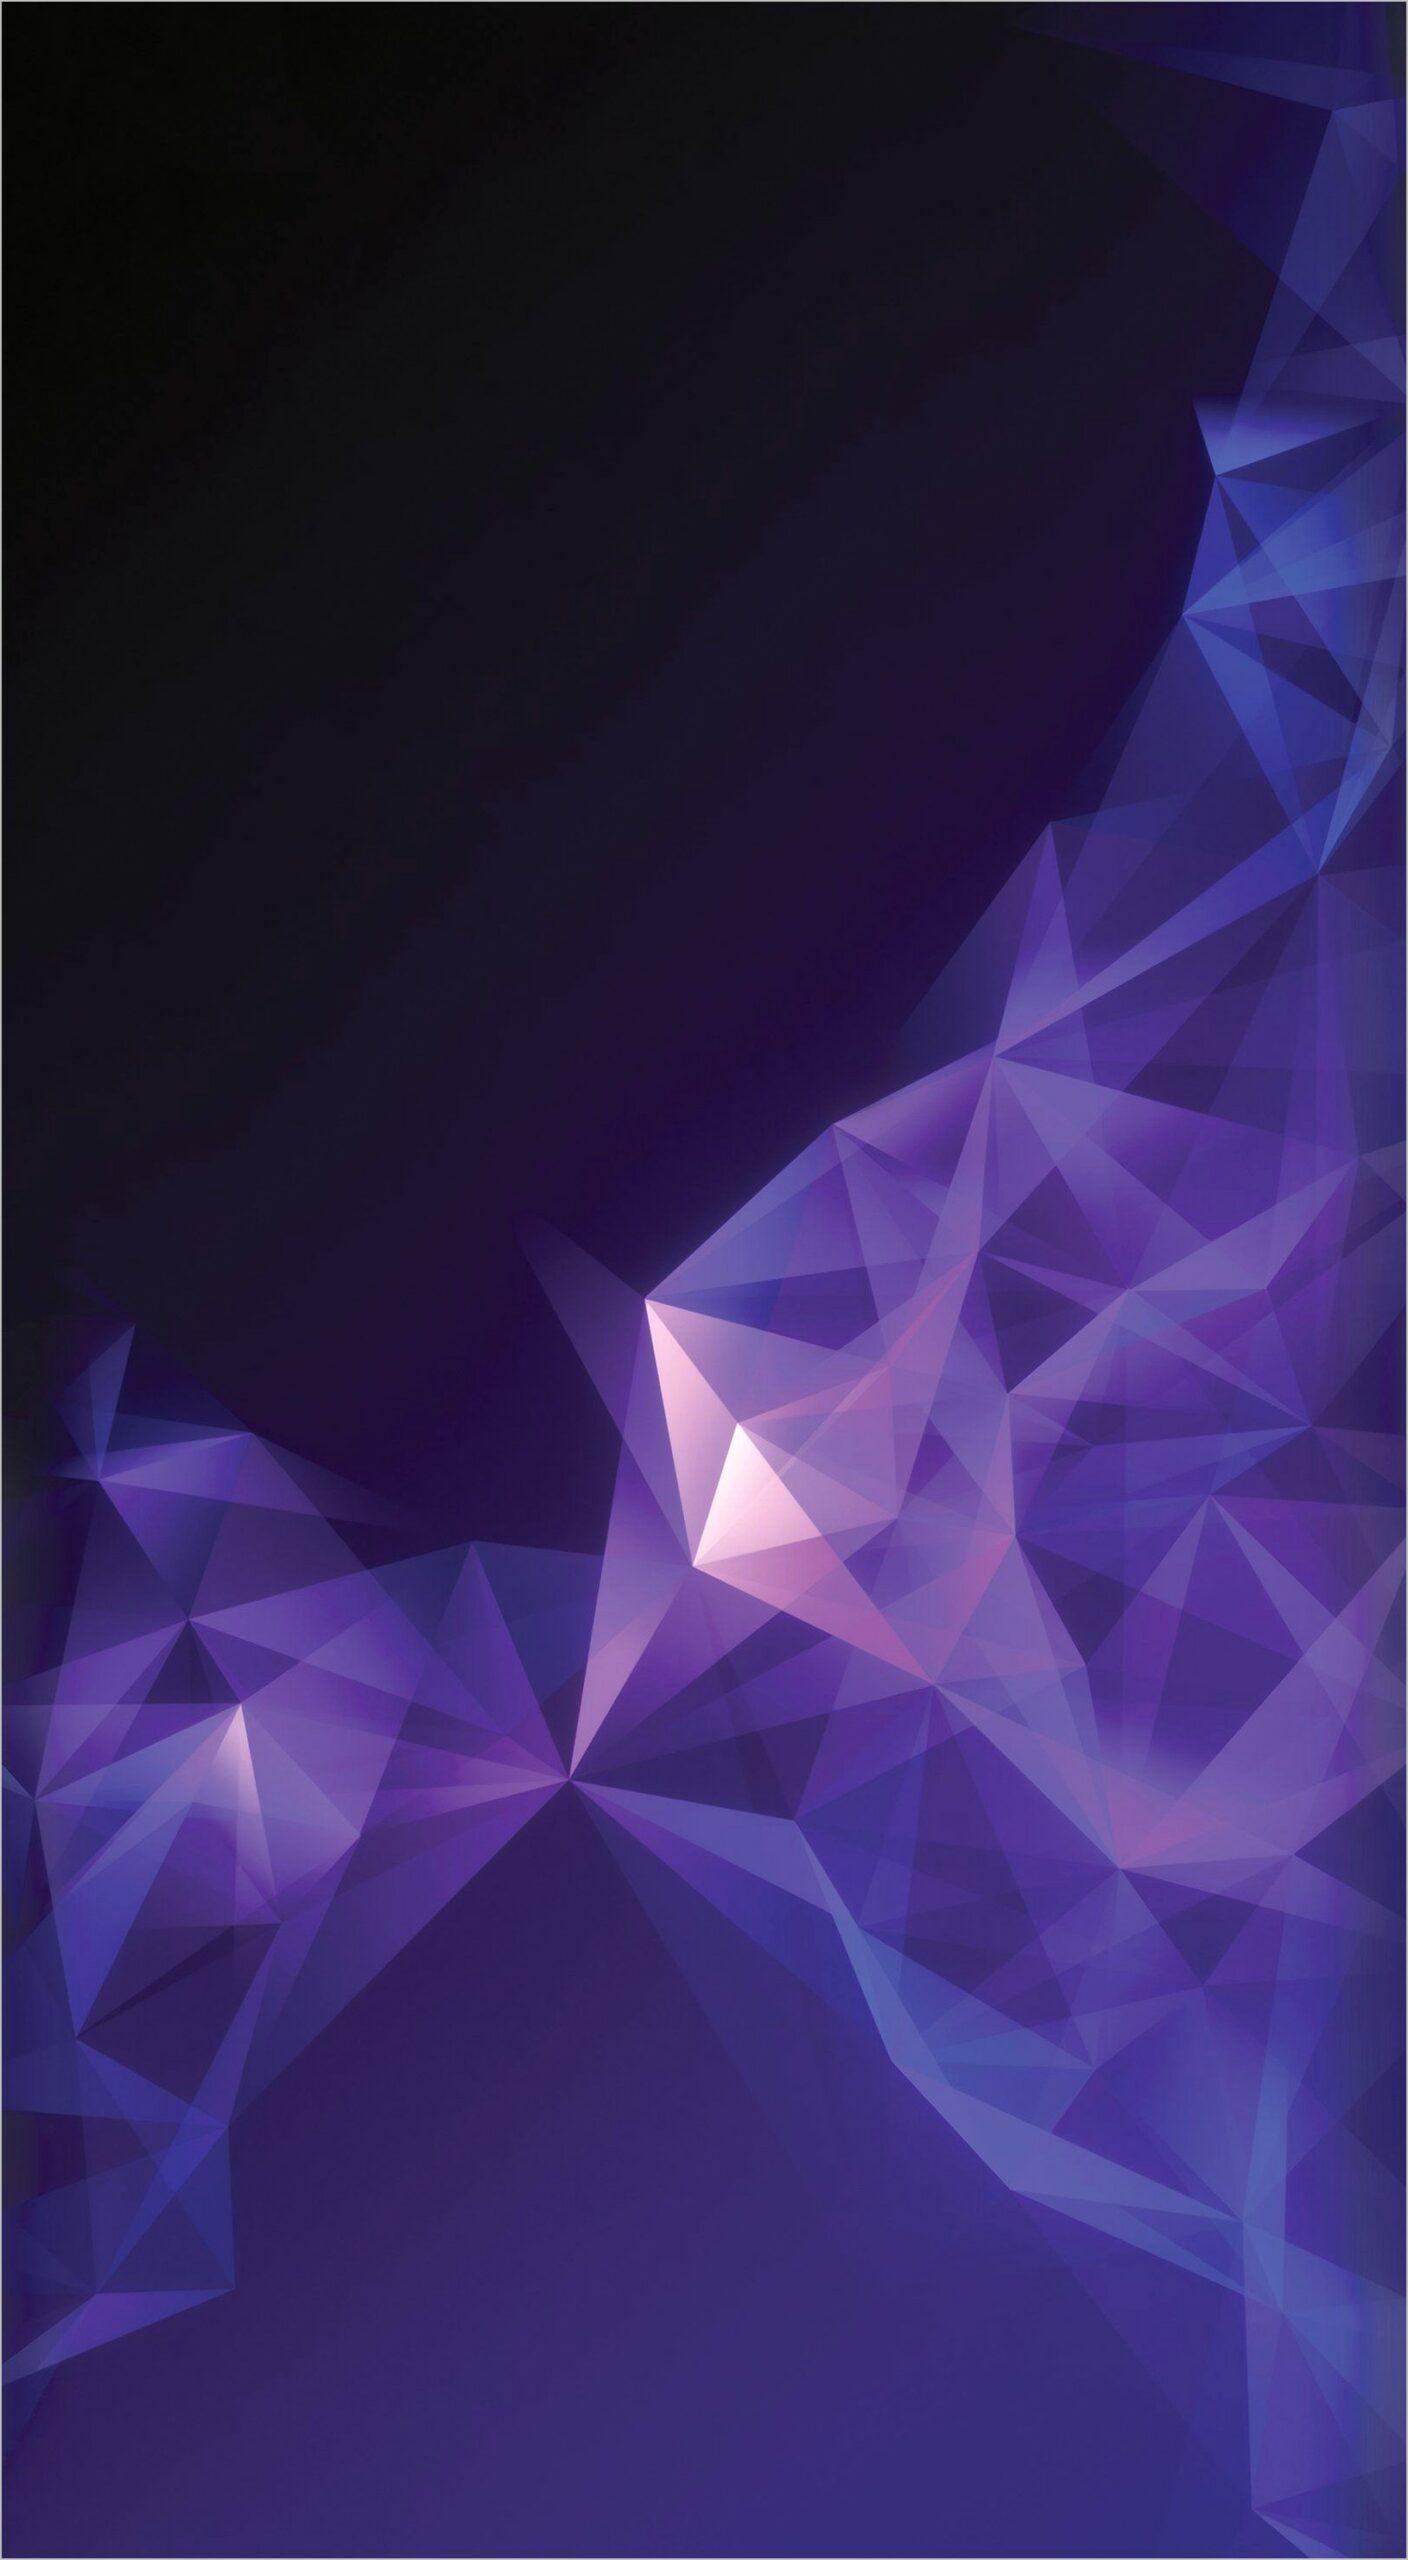 Galaxy S8 Plus Cool 4k Wallpaper In 2020 Samsung Galaxy S8 Wallpapers Galaxy S8 Wallpaper Galaxy Phone Wallpaper